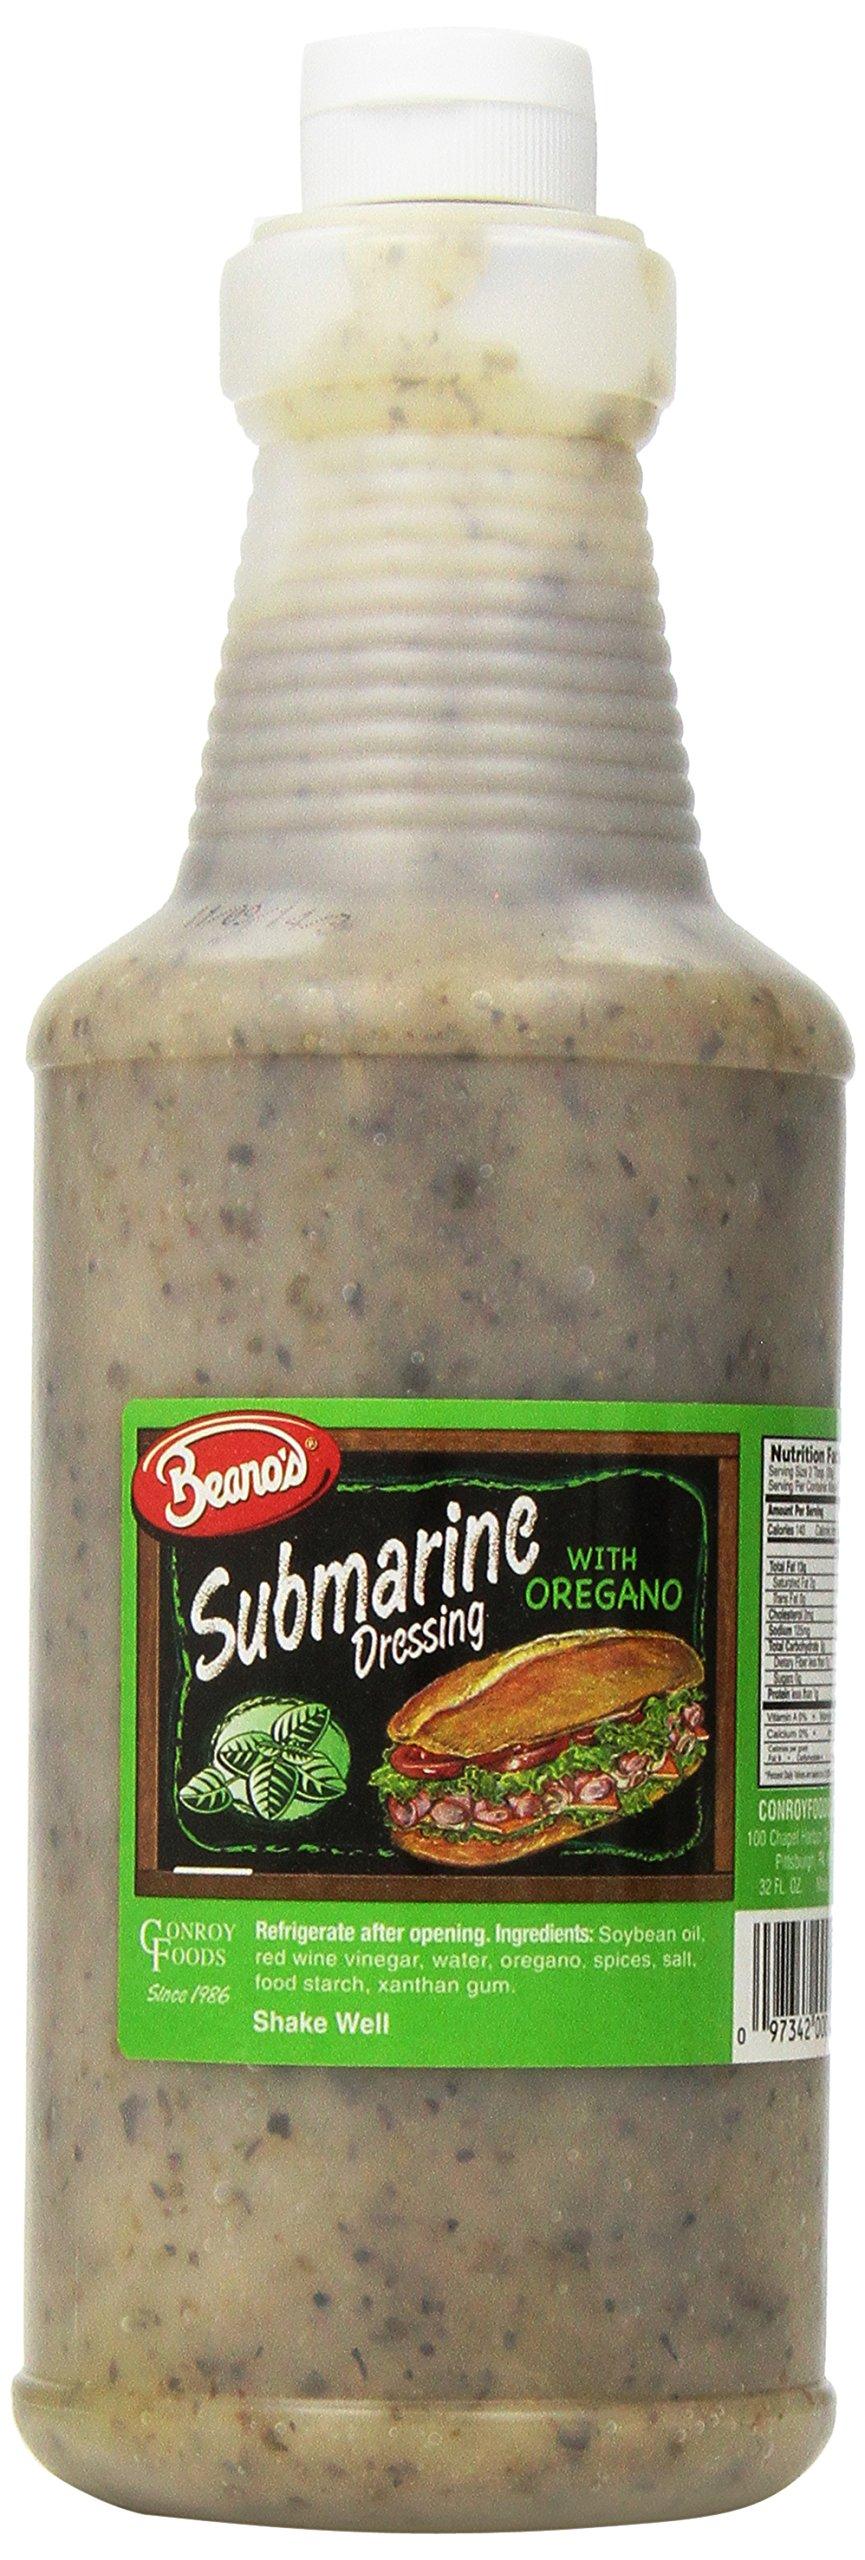 Beano's Submarine Dressing, Oregano, 32 Ounce (Pack of 4)